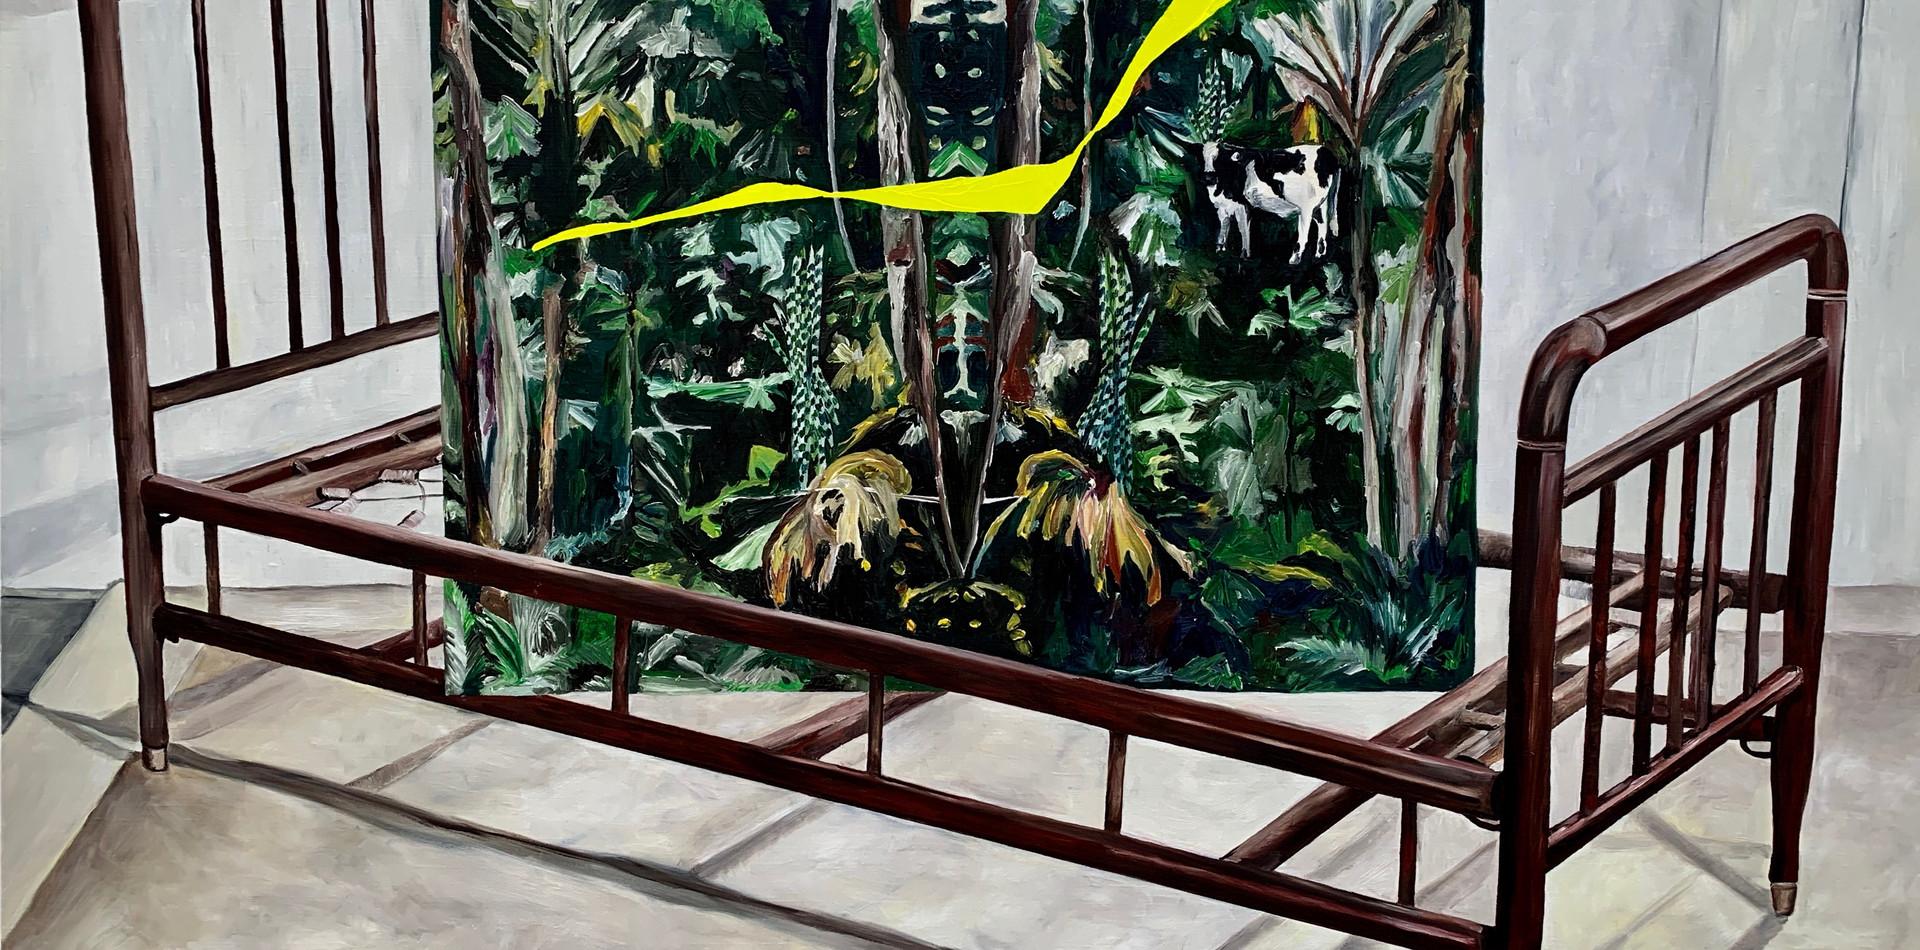 Paradise III   2019 Óleo sobre tela/ oil on canvas 70 x 100 cm